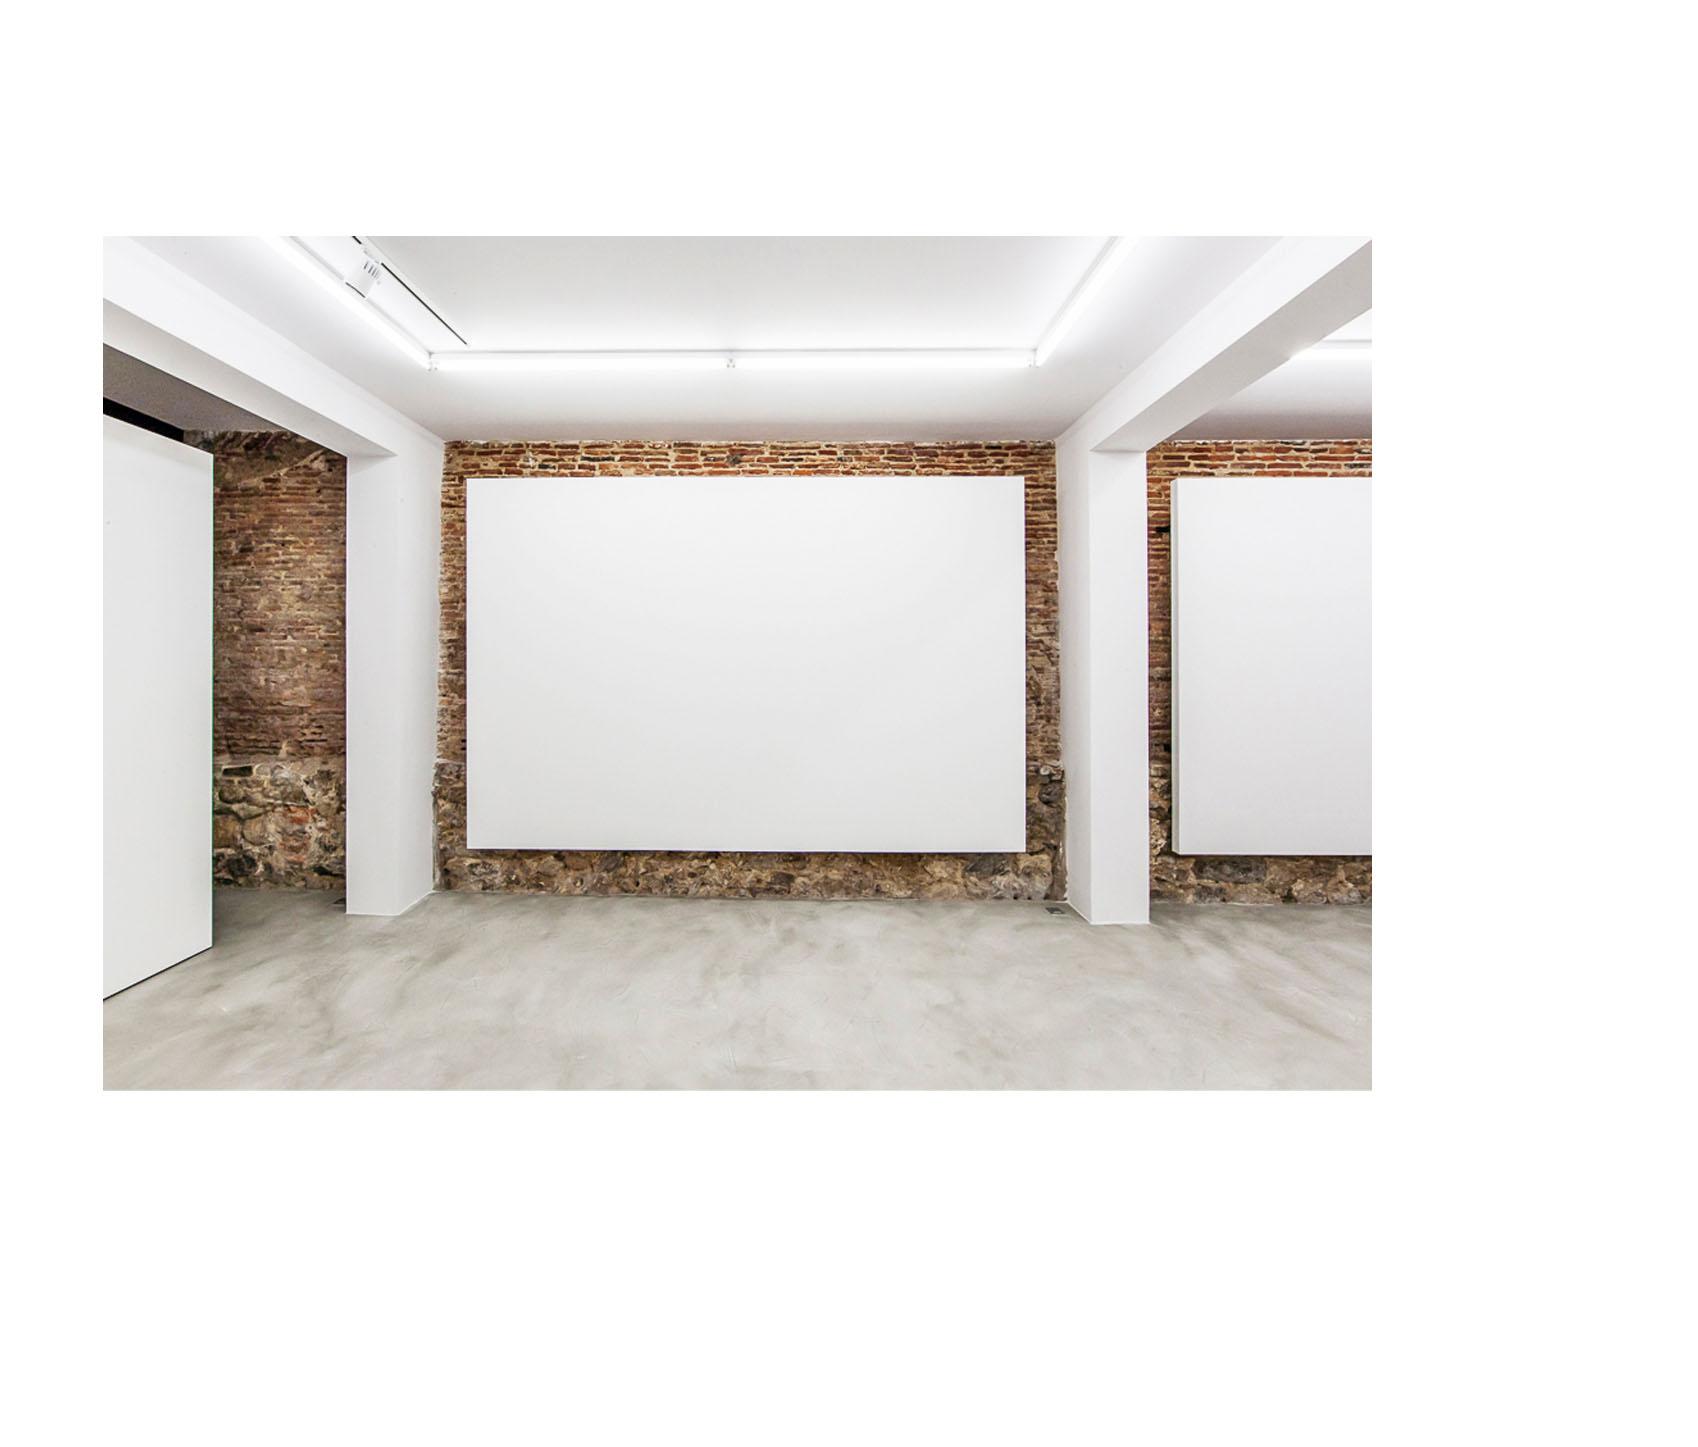 Art Gallery Aldama-Fabré-Bilbao-Image 05.jpg